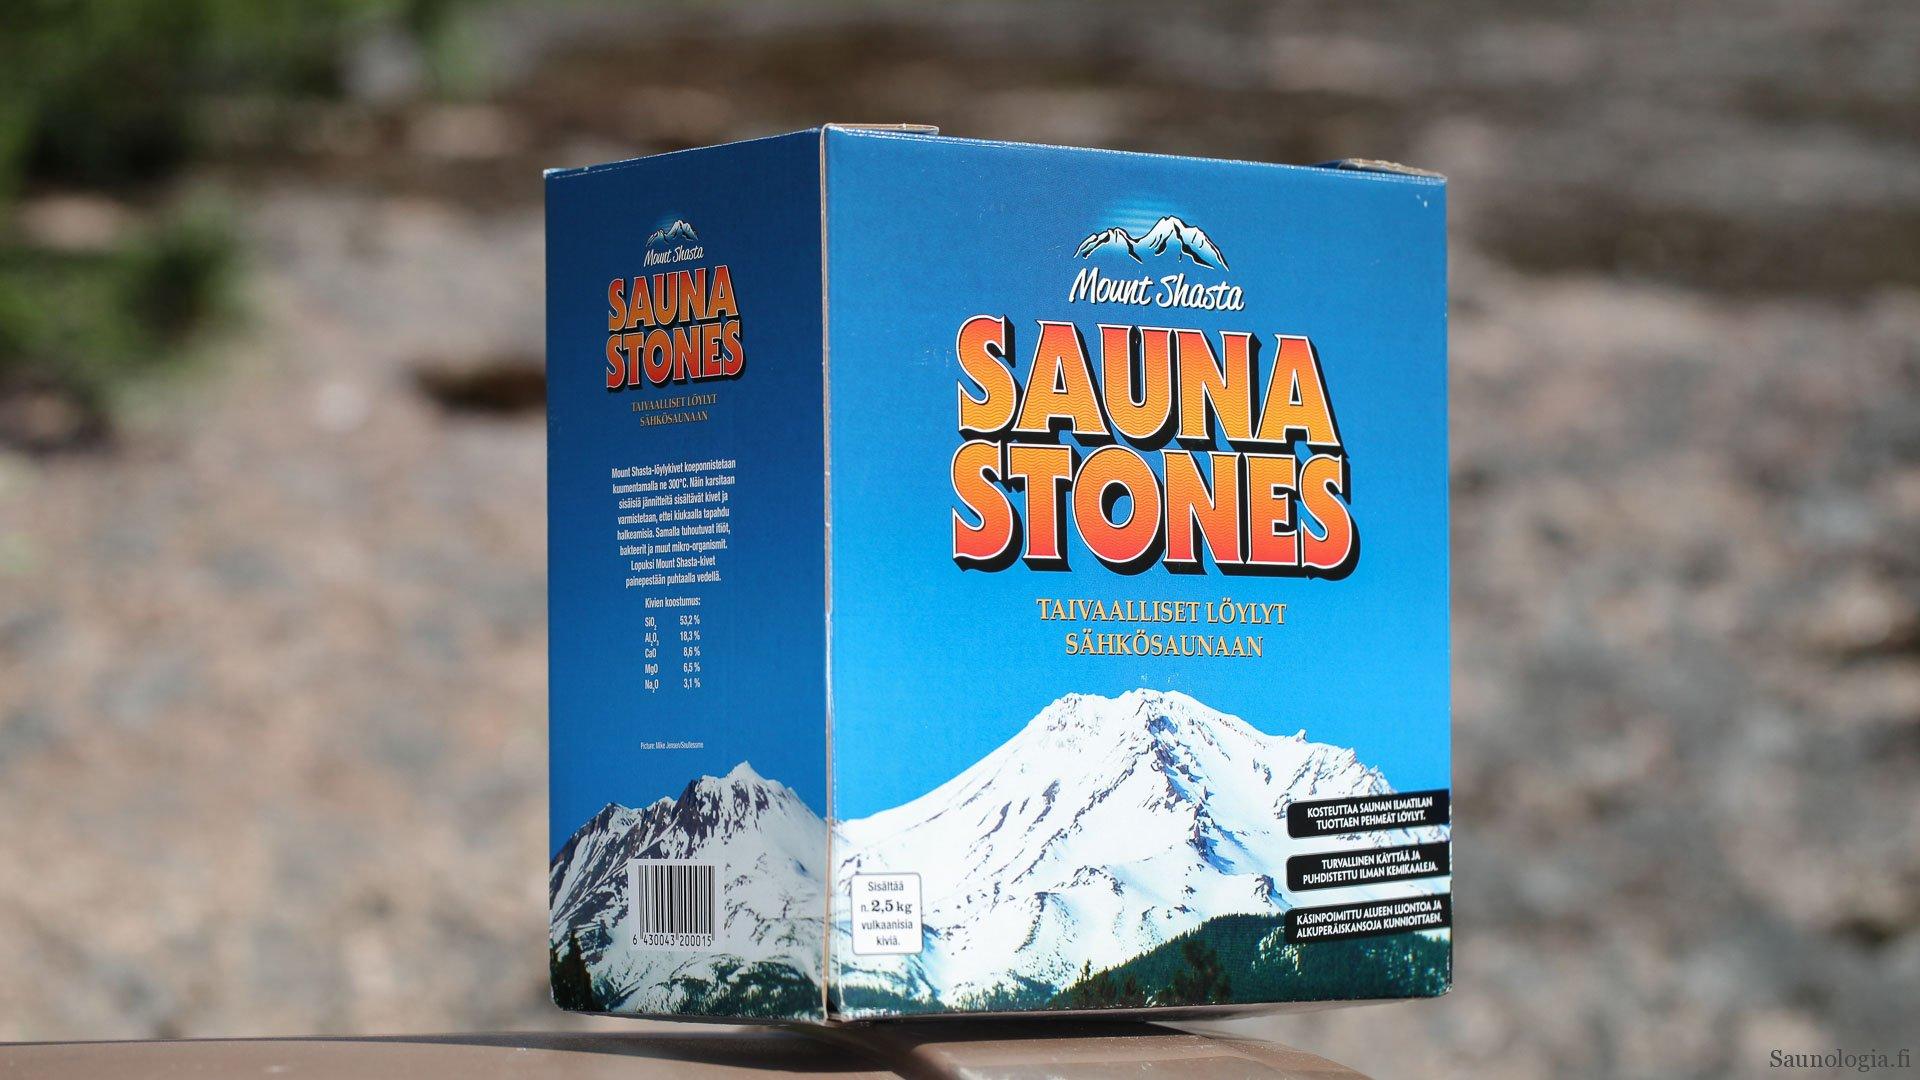 Pikatesti Mount Shasta Sauna stones – California steaming